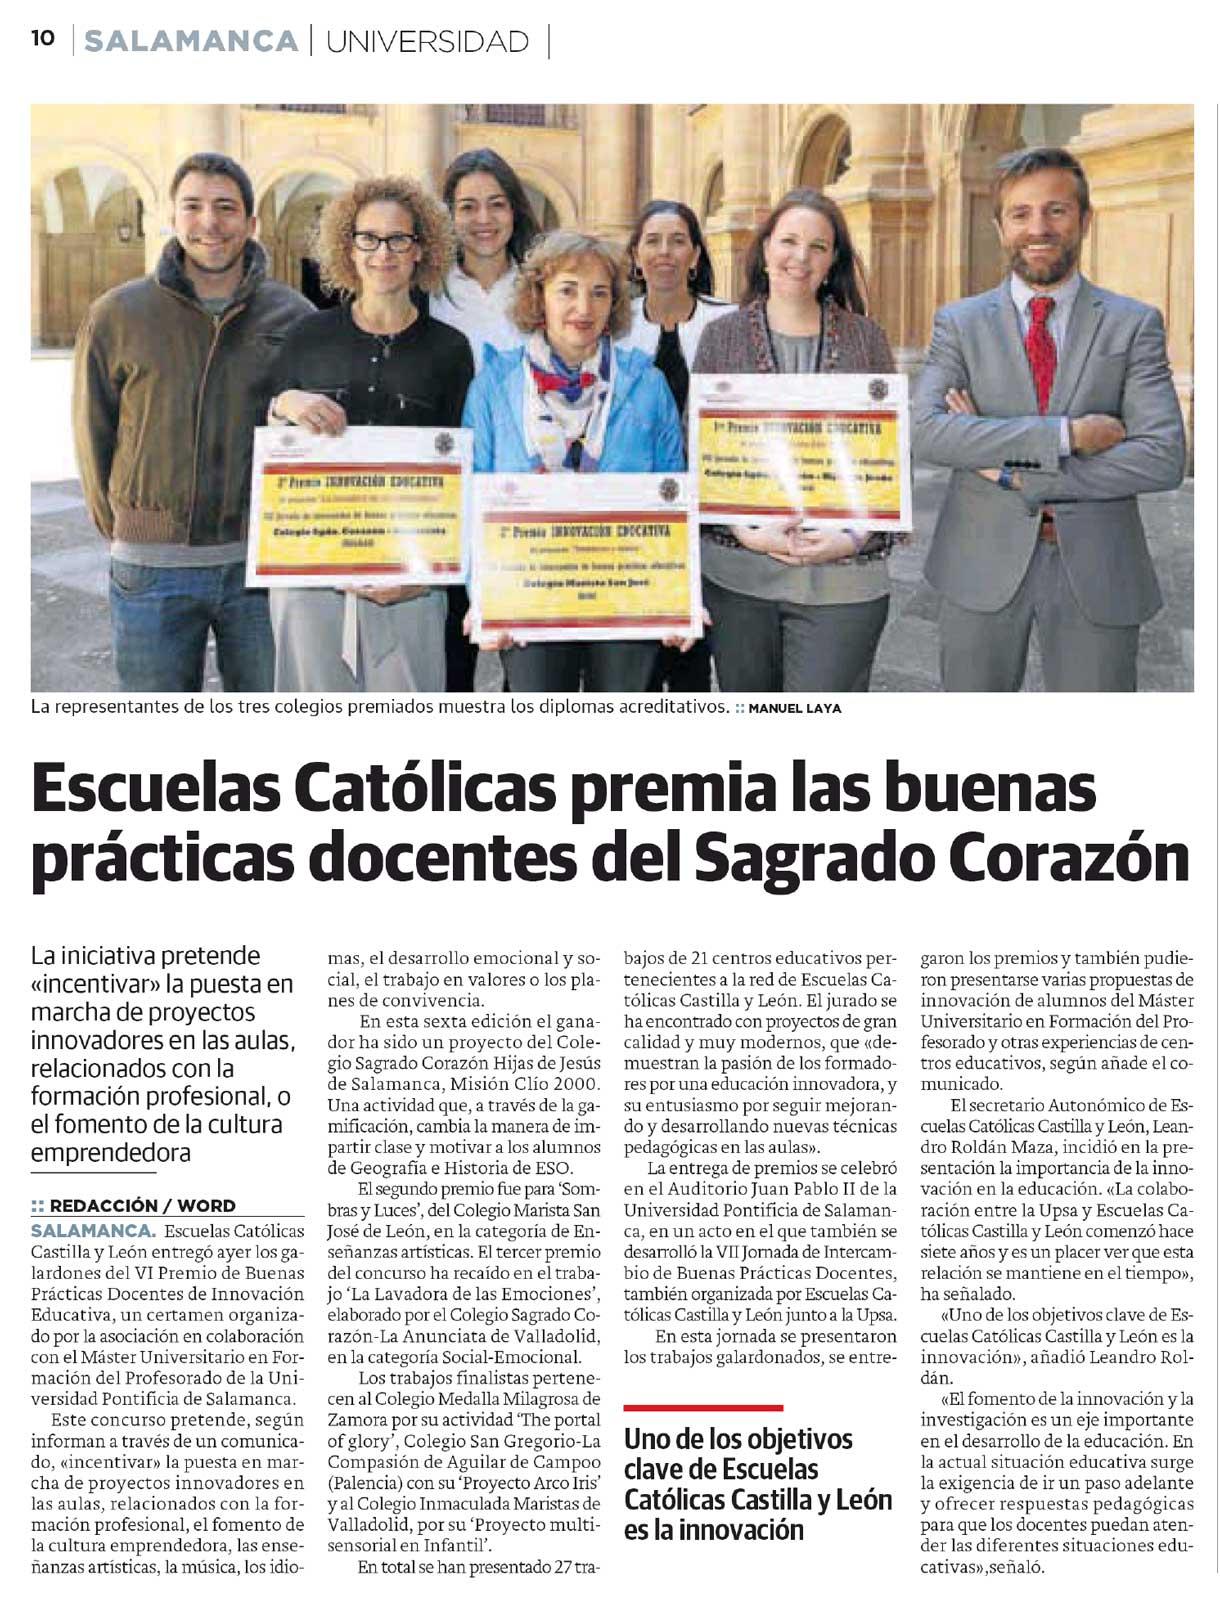 28-abril-Norte-de-Castilla-